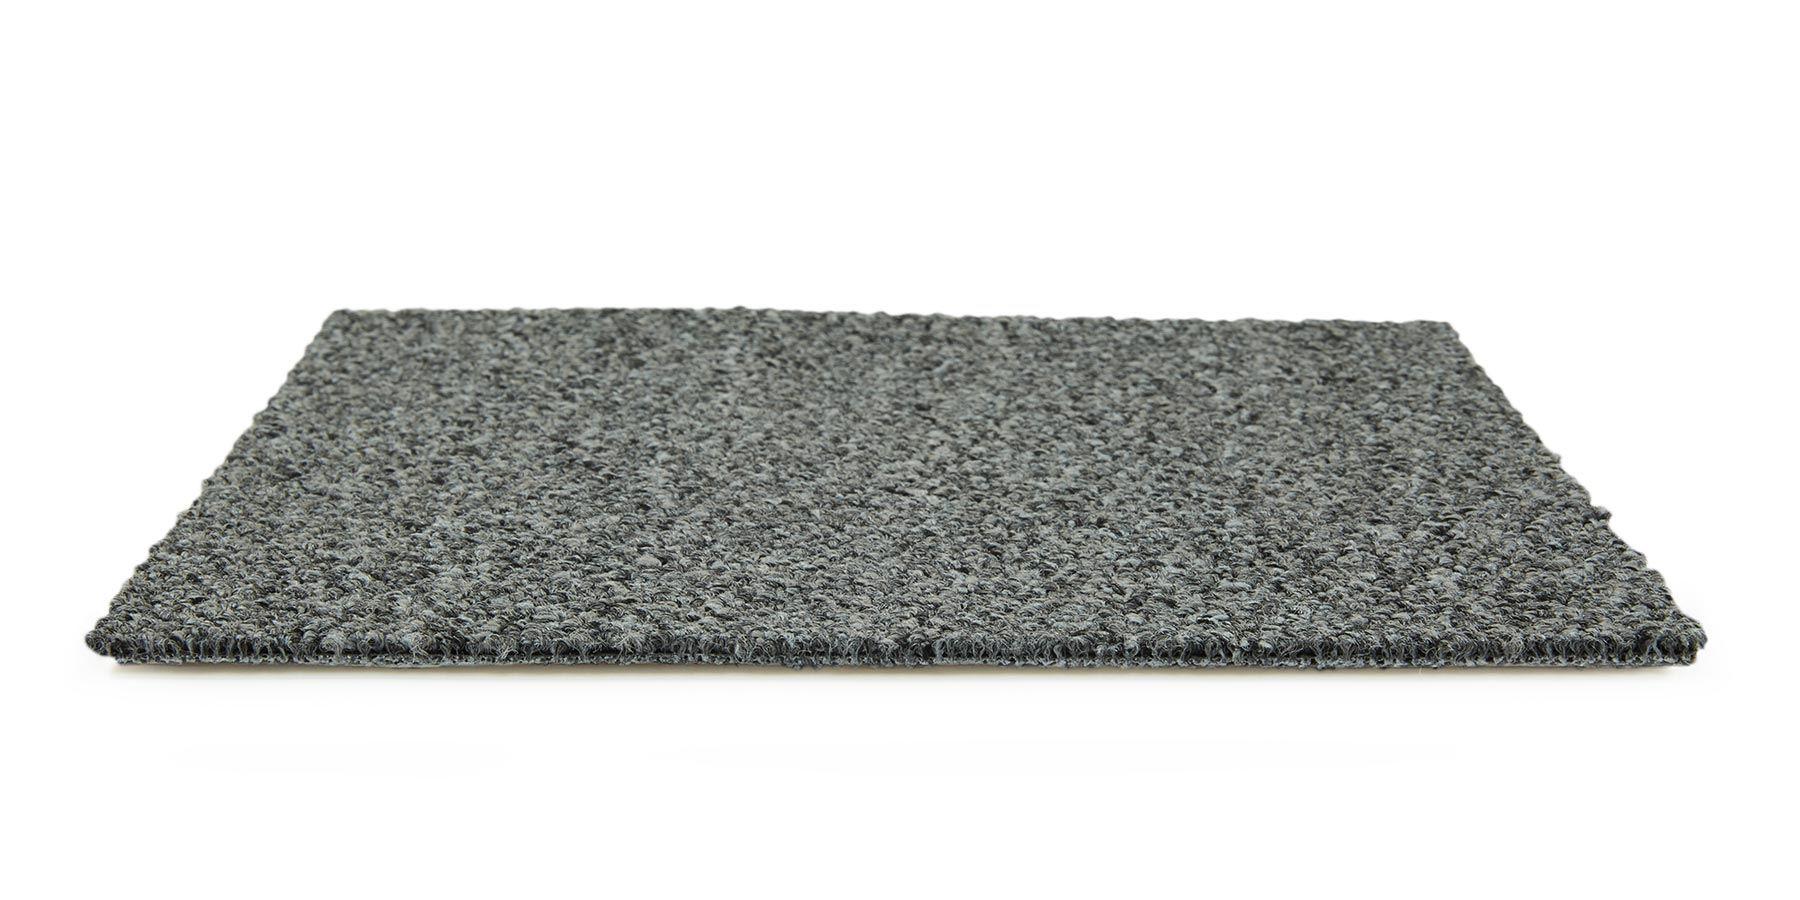 Tenbrooke II Smoke Screen Carpet